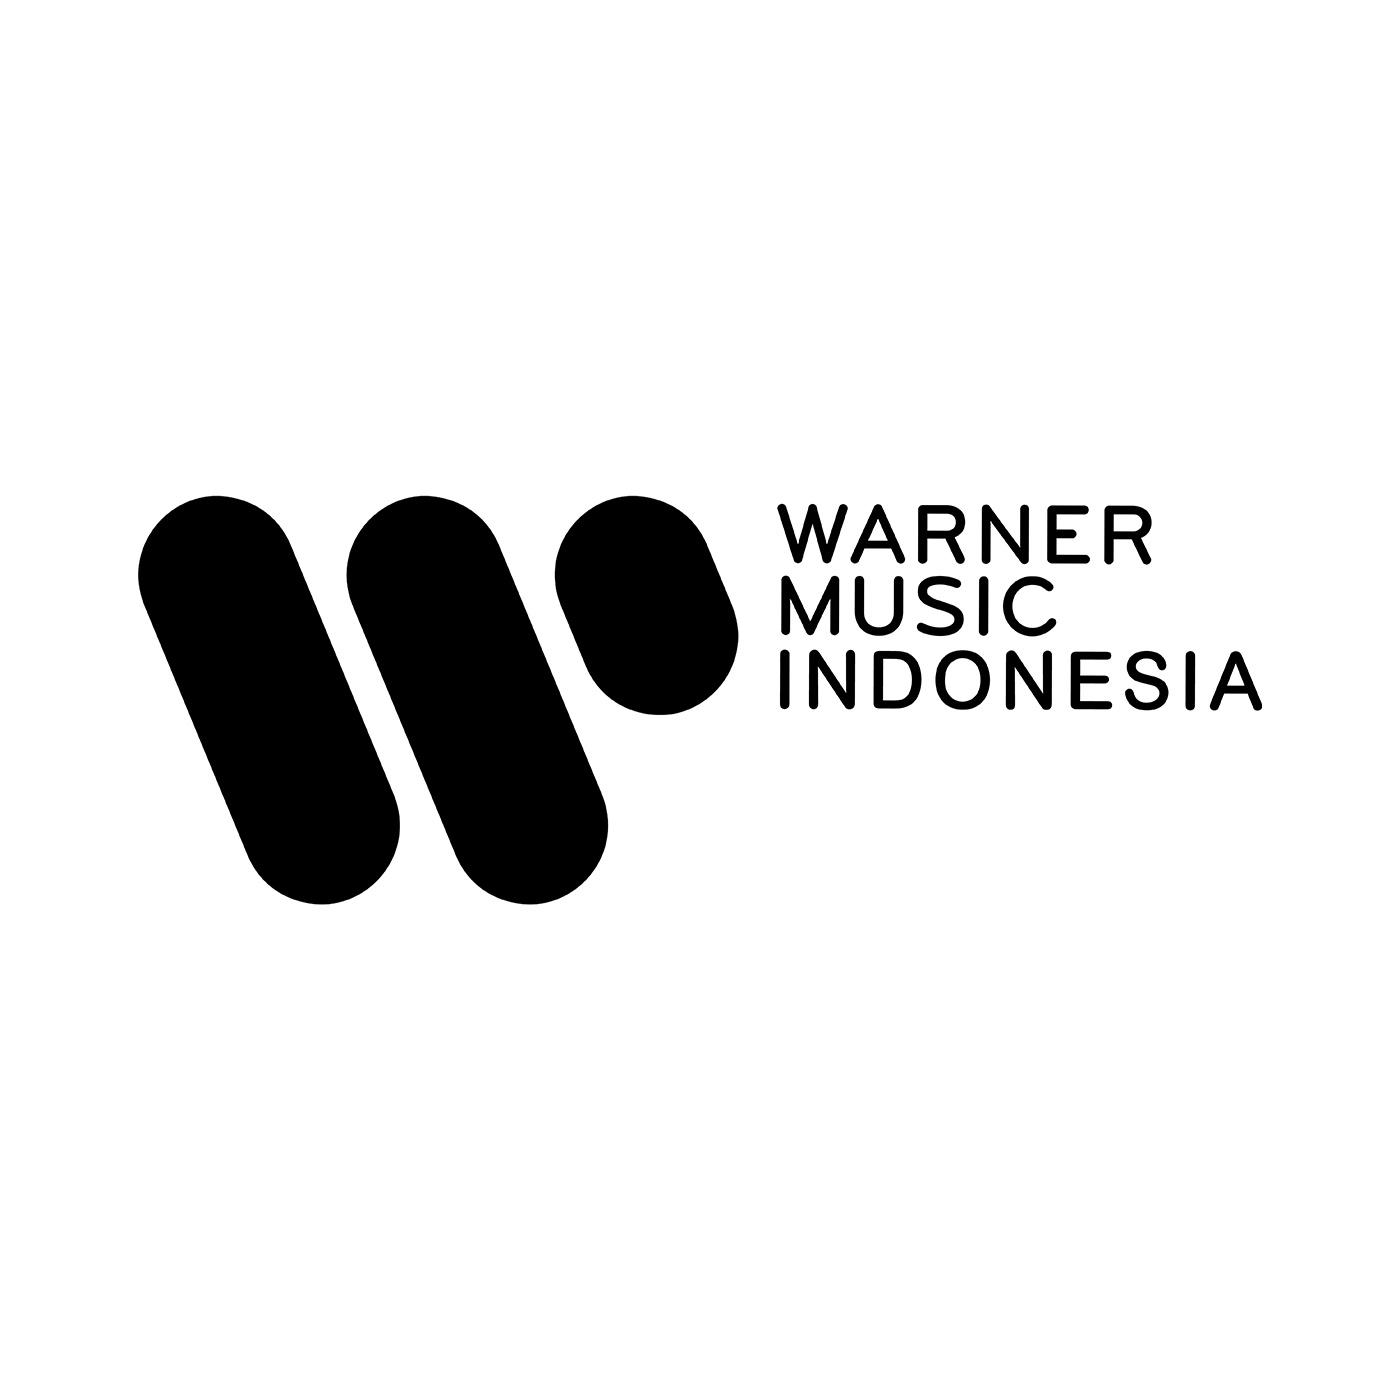 Warner Music Indonesia